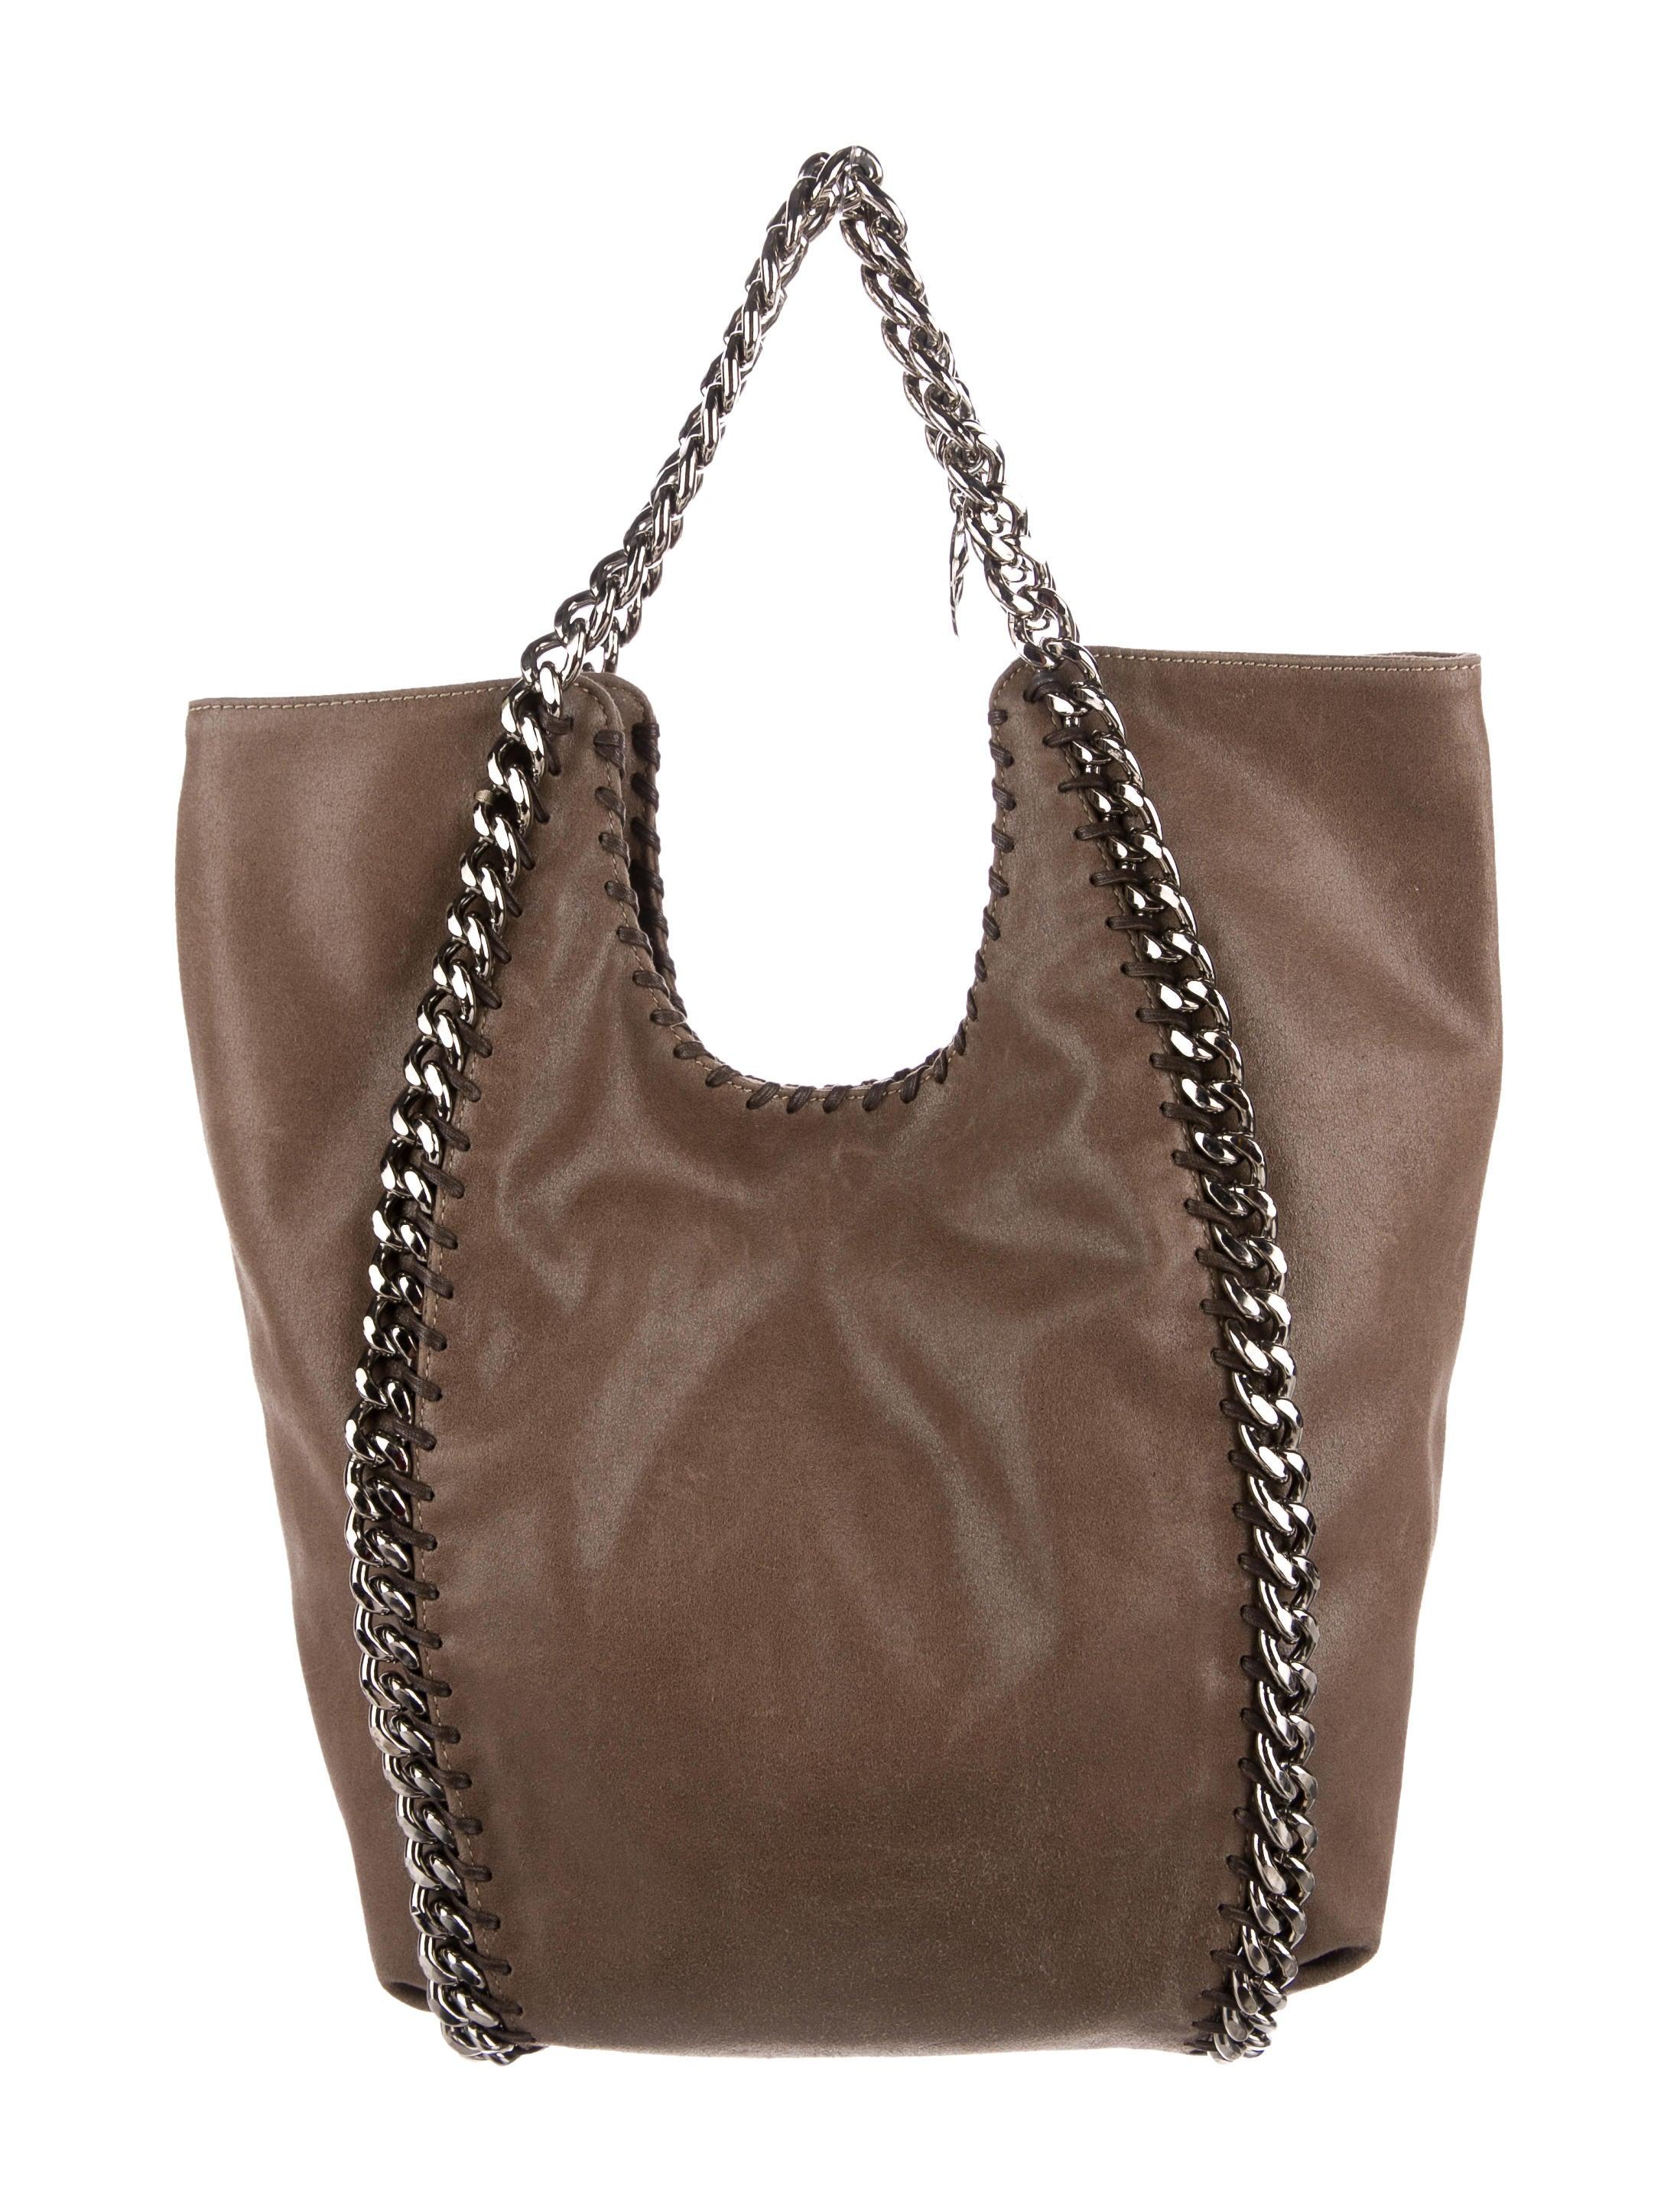 stella mccartney falabella chain tote handbags stl56918 the realreal. Black Bedroom Furniture Sets. Home Design Ideas